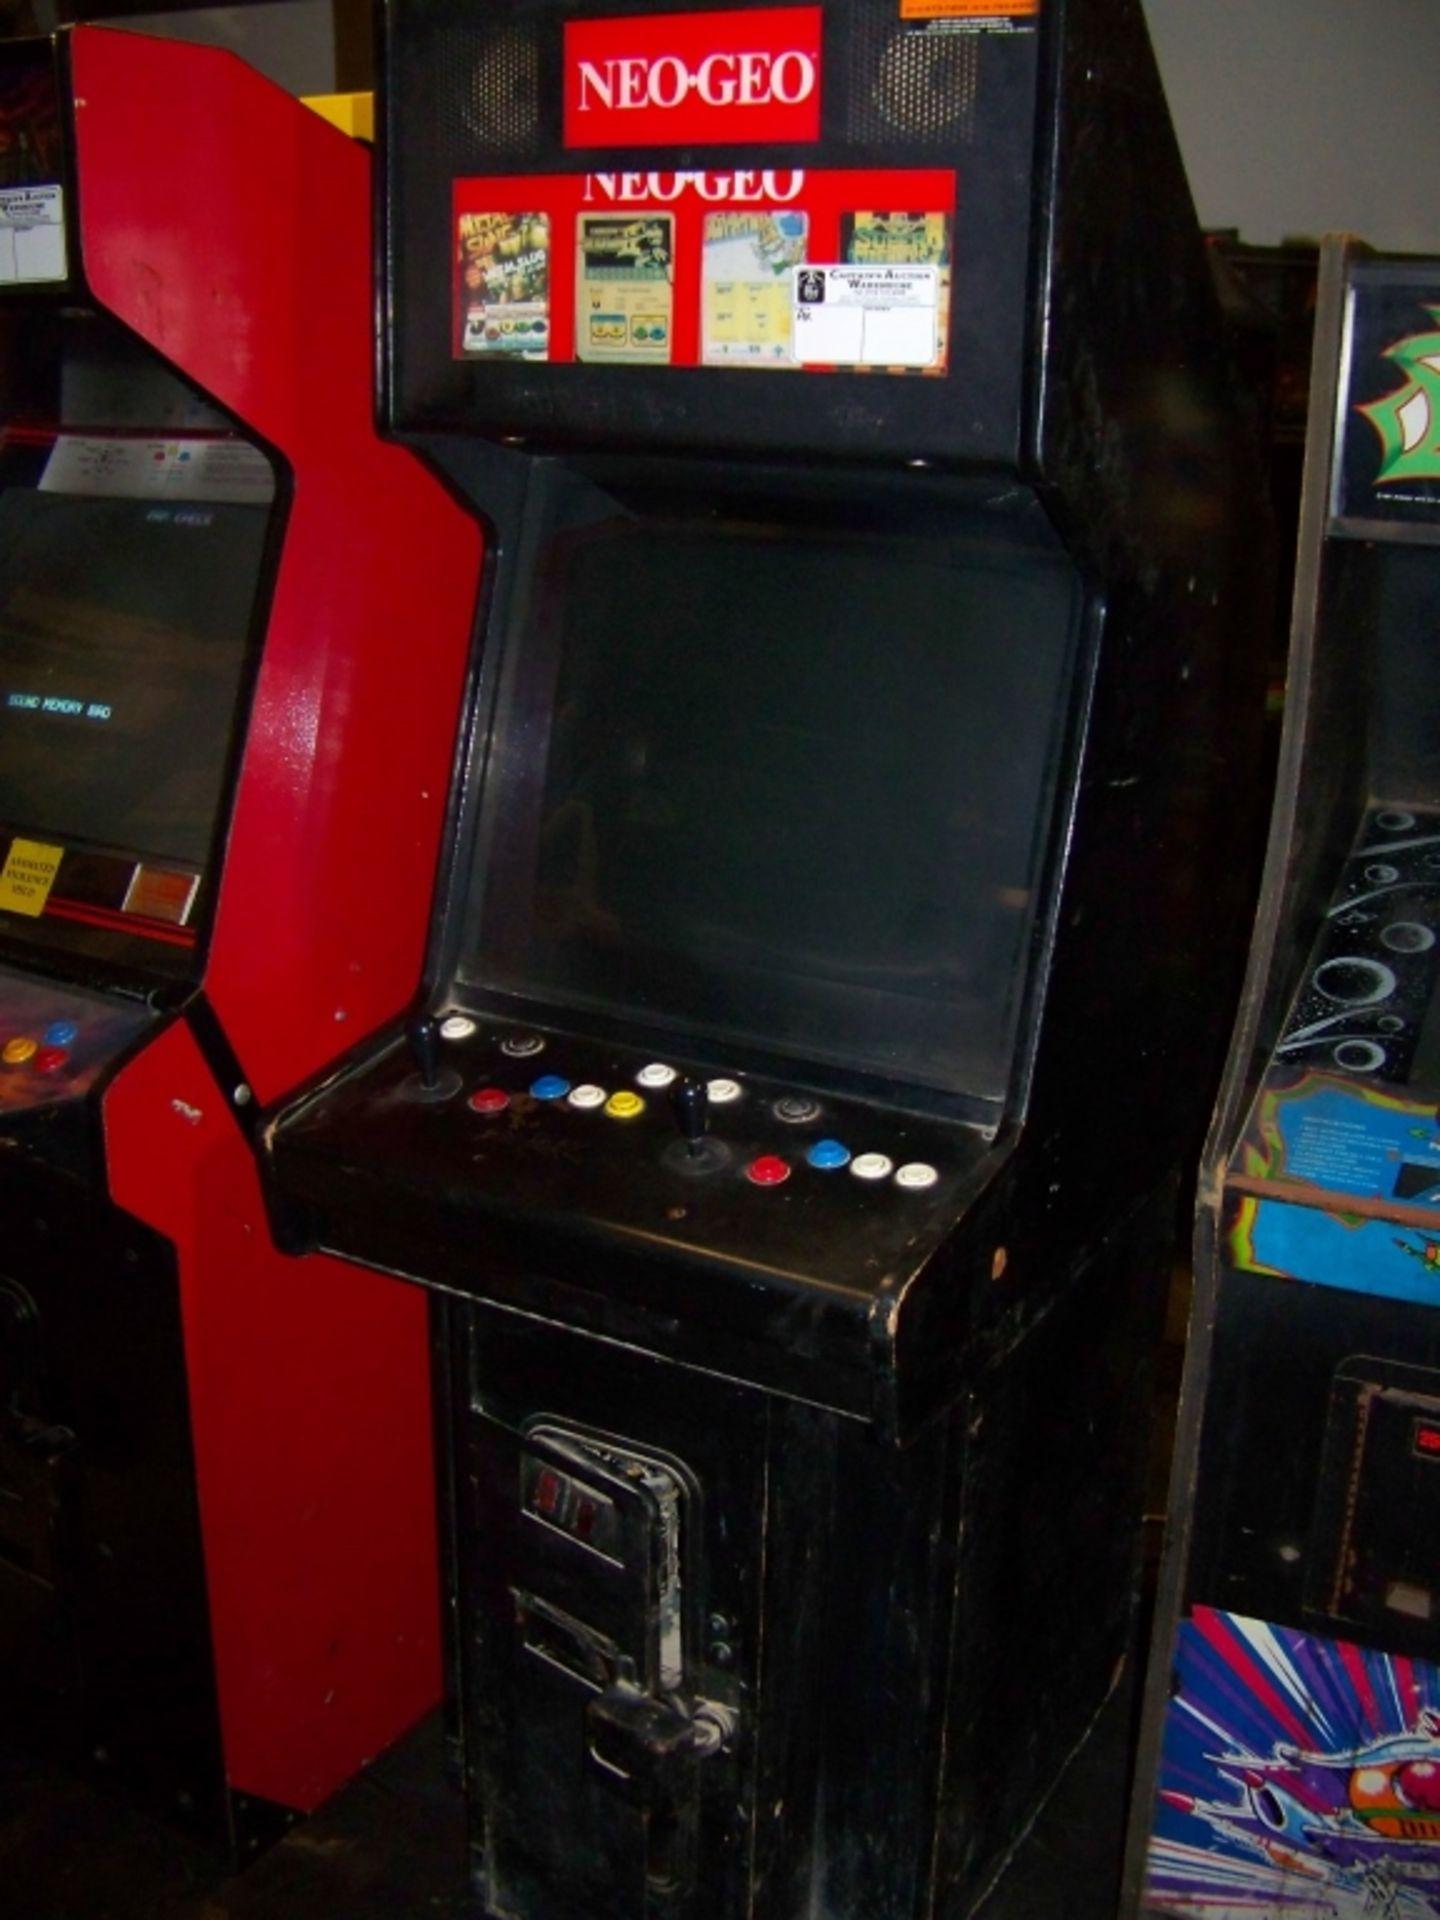 NEO GEO 4 SLOT ARCADE GAME SNK   AX